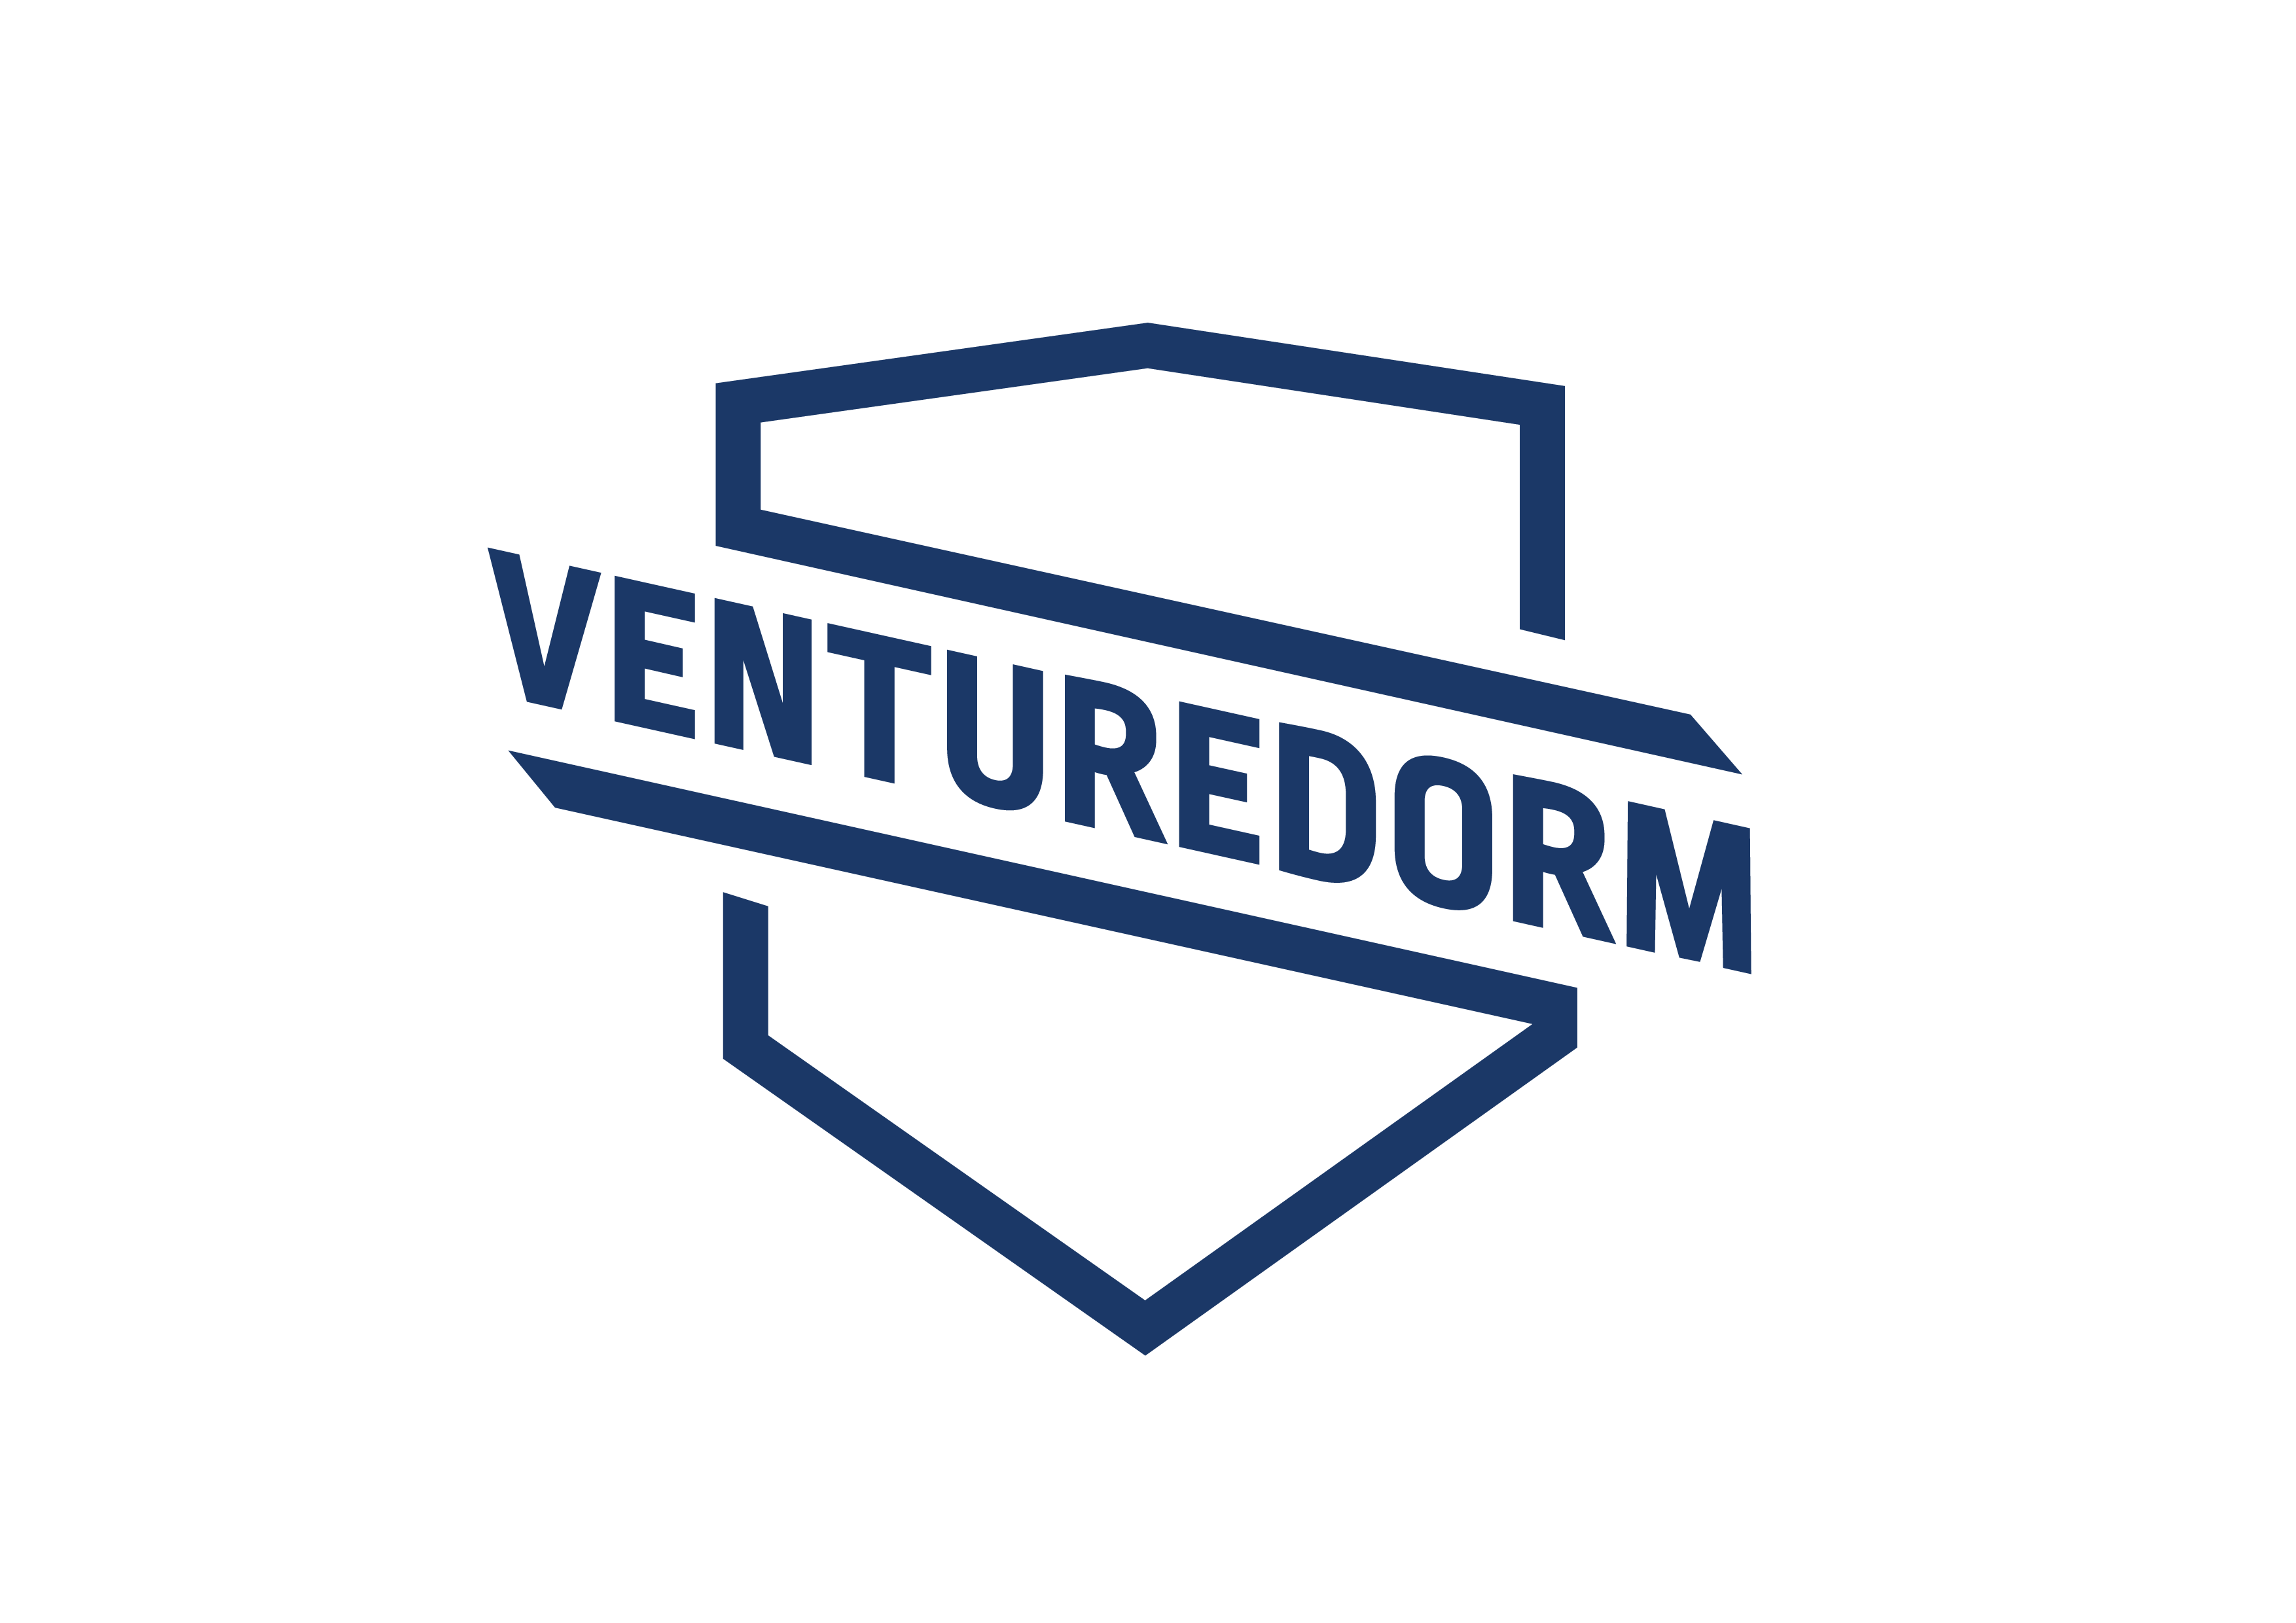 Venture Dorm logo